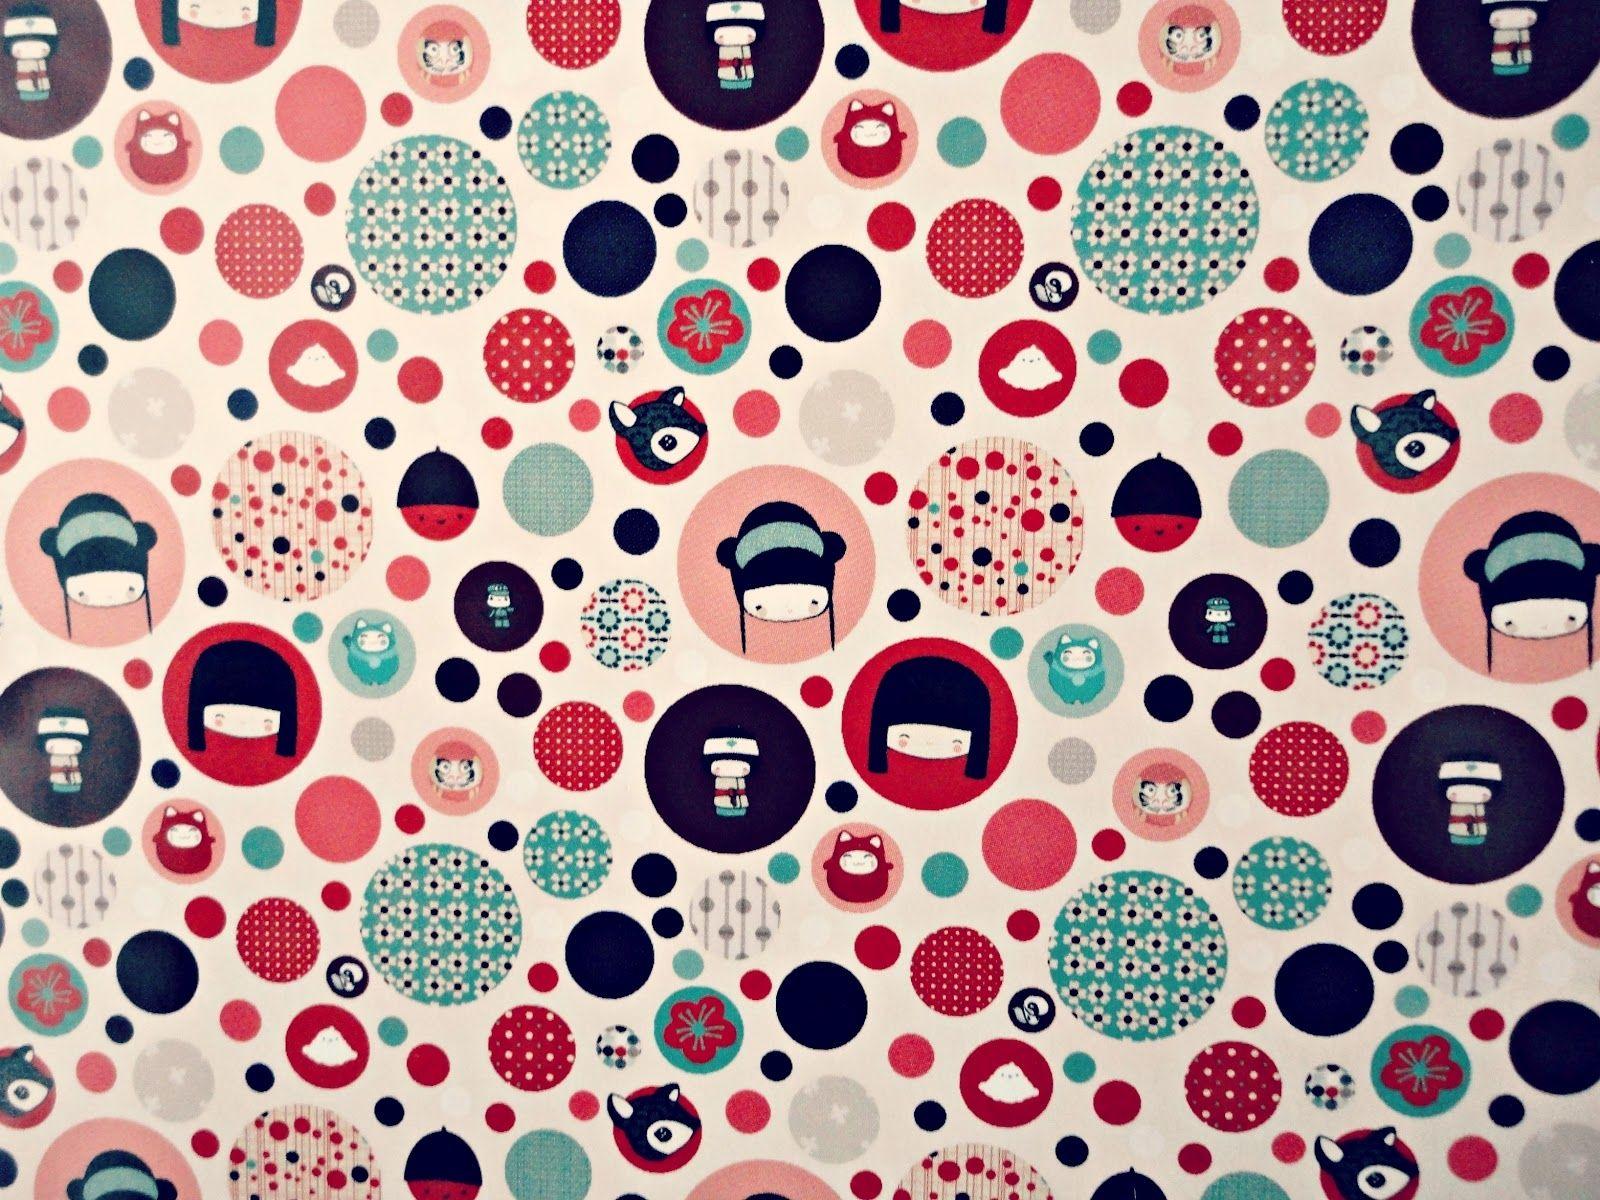 Cute Wallpaper Backgrounds Tumblr Cute Tumblr Wallpaper Tribal Pattern Wallpaper Wallpaper Iphone Cute